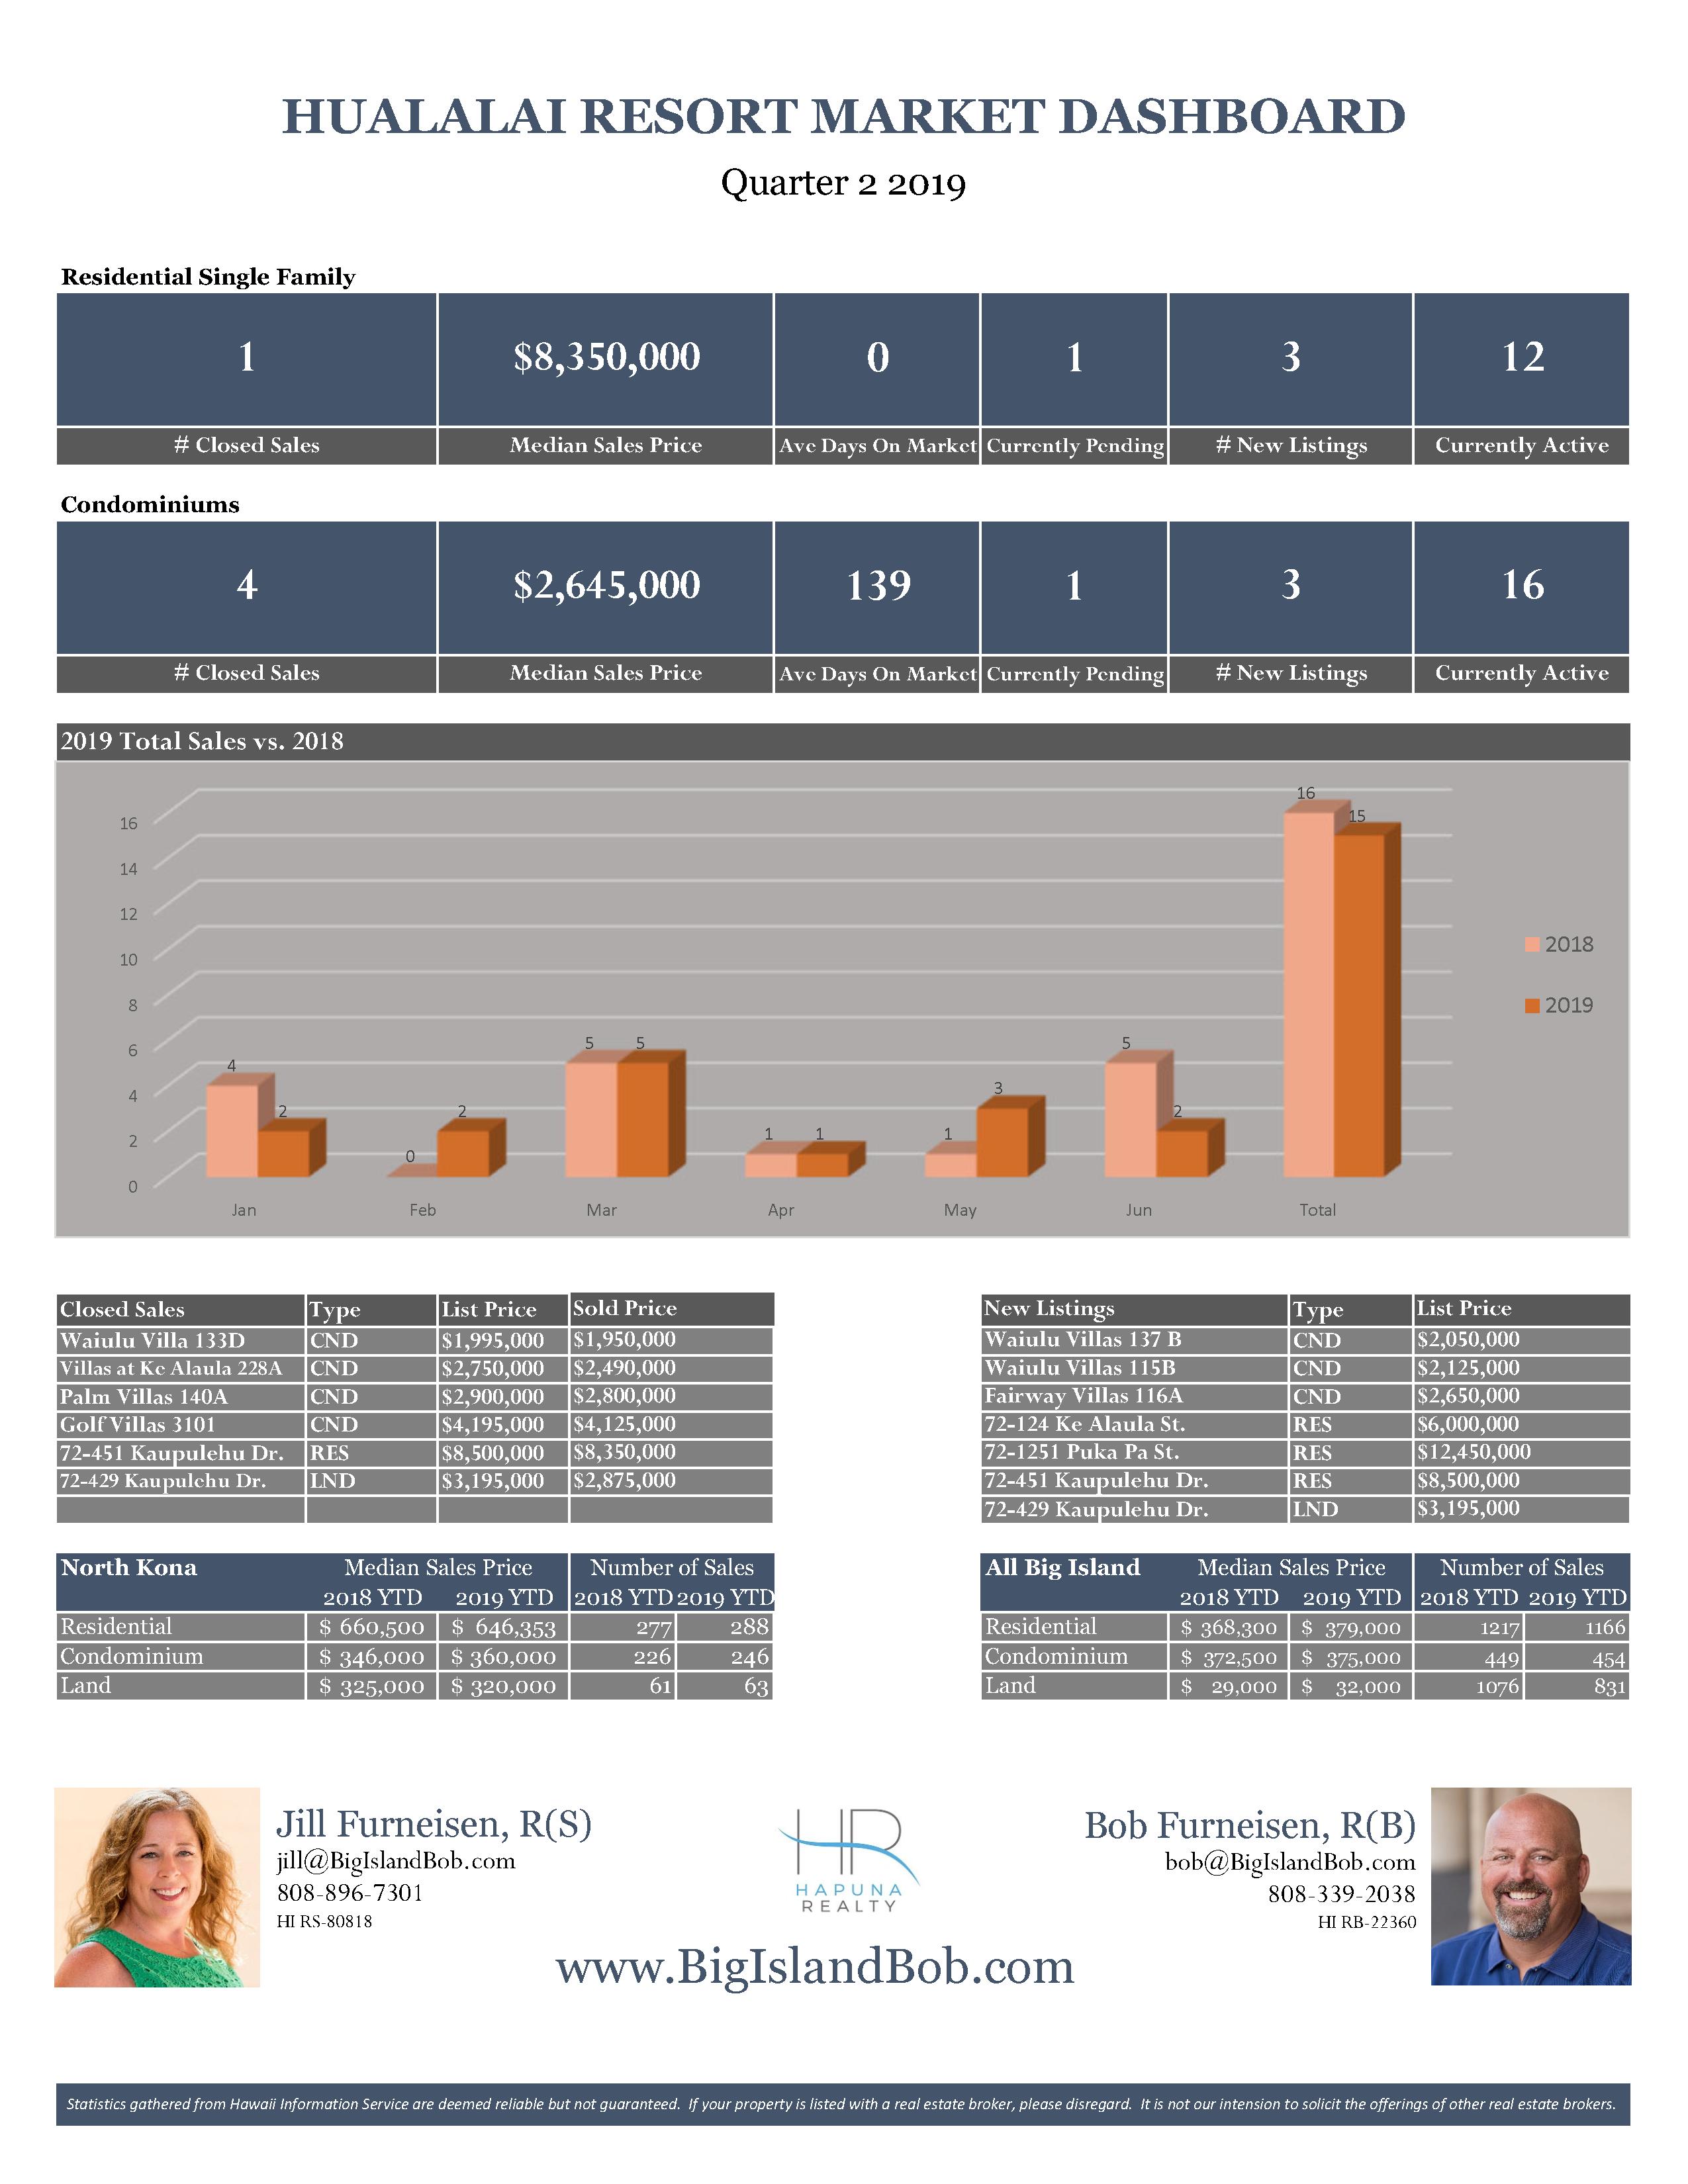 Hualalai Resort Quarter 2 2019 Real Estate Market Dashboard